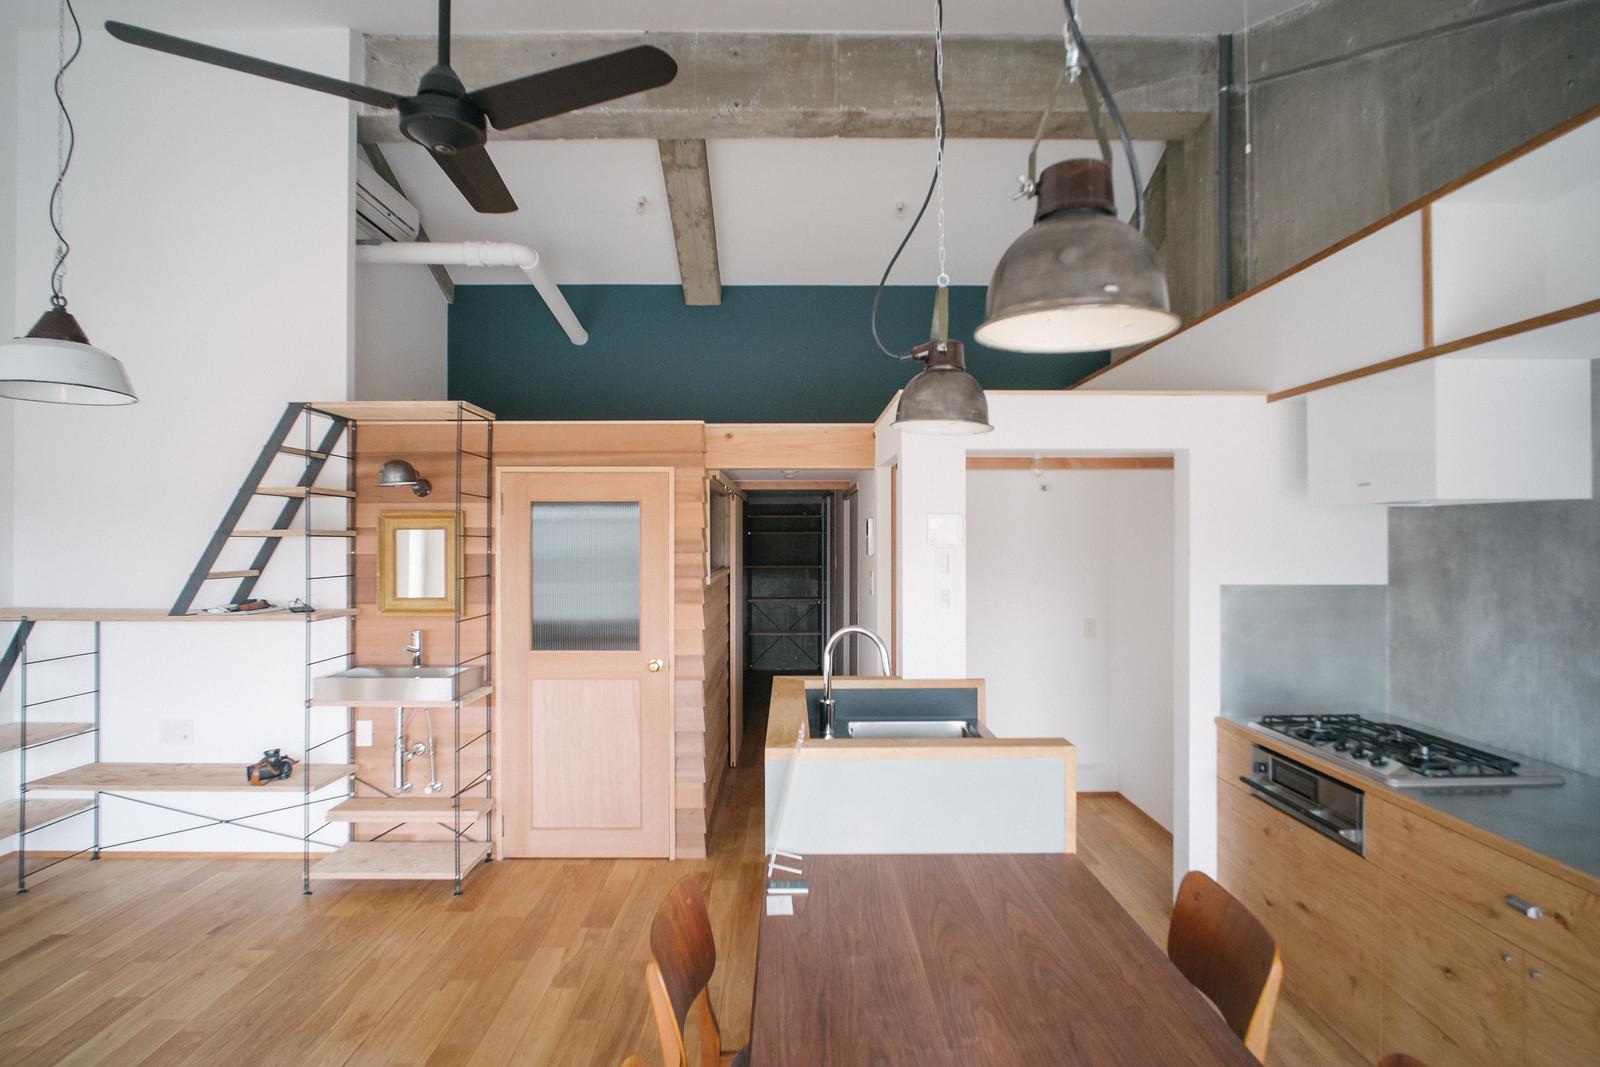 Renovation_170312 / open house